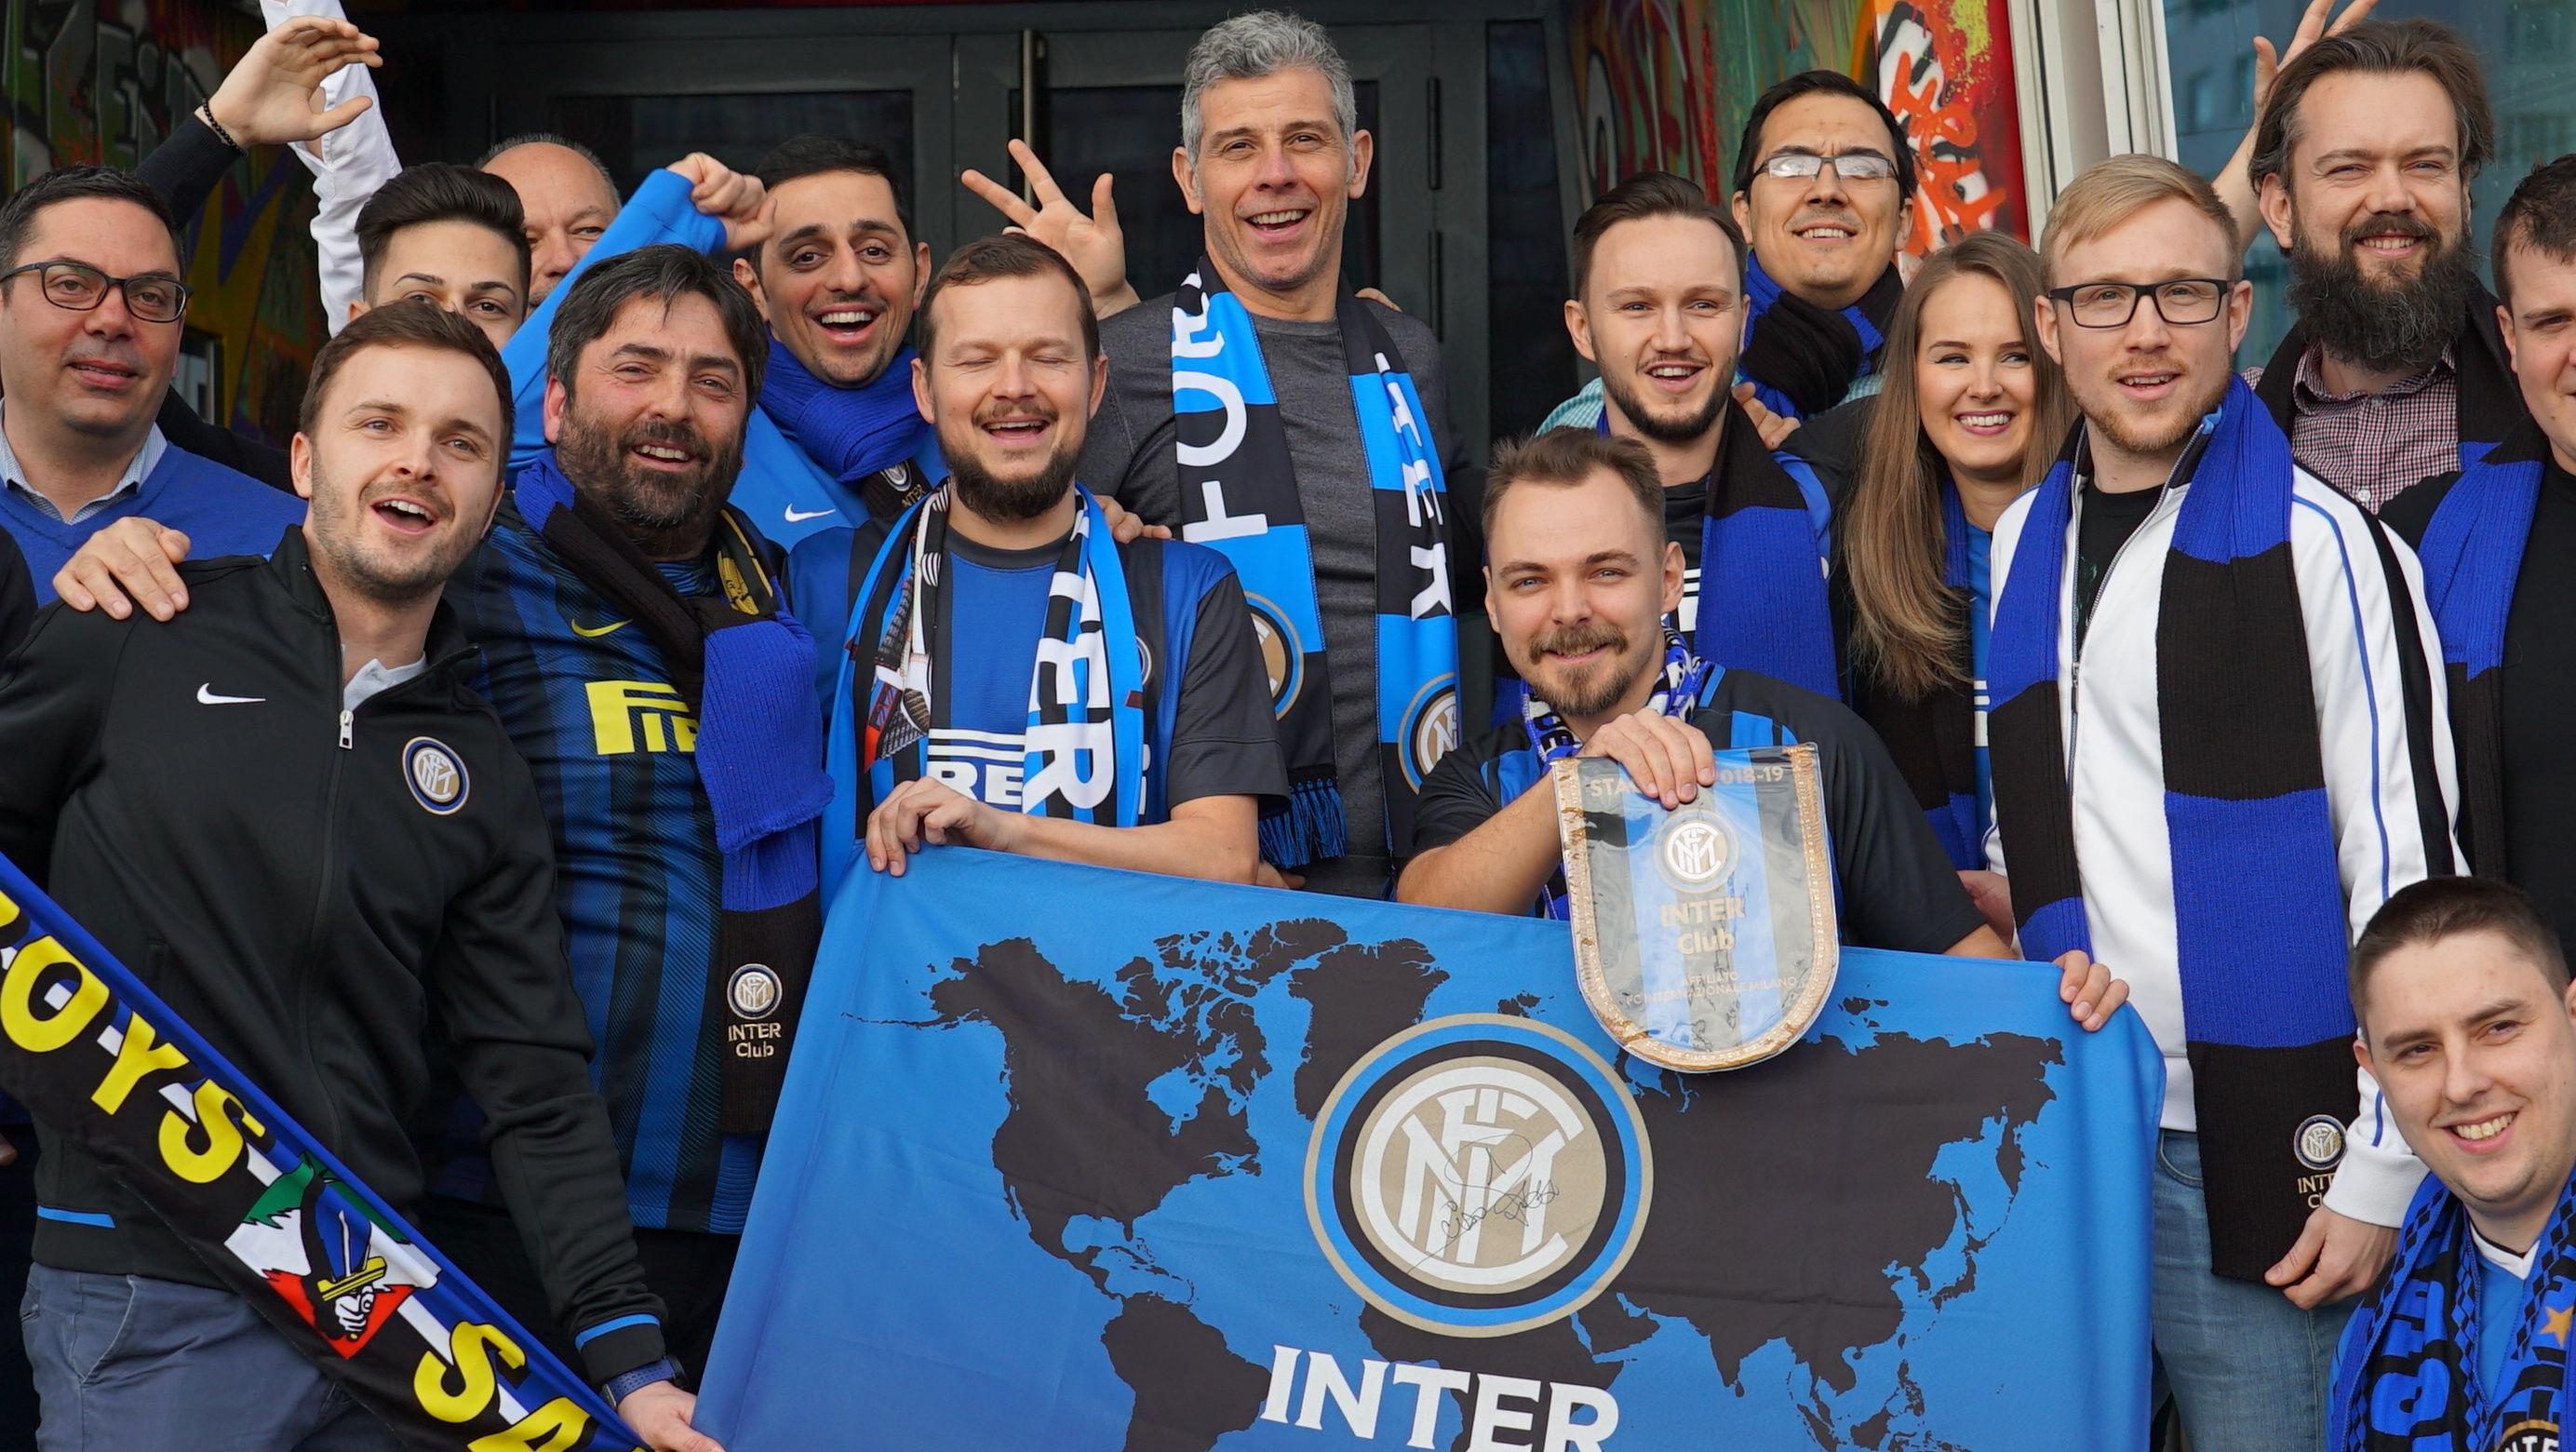 Inter Club Austria meets Toldo